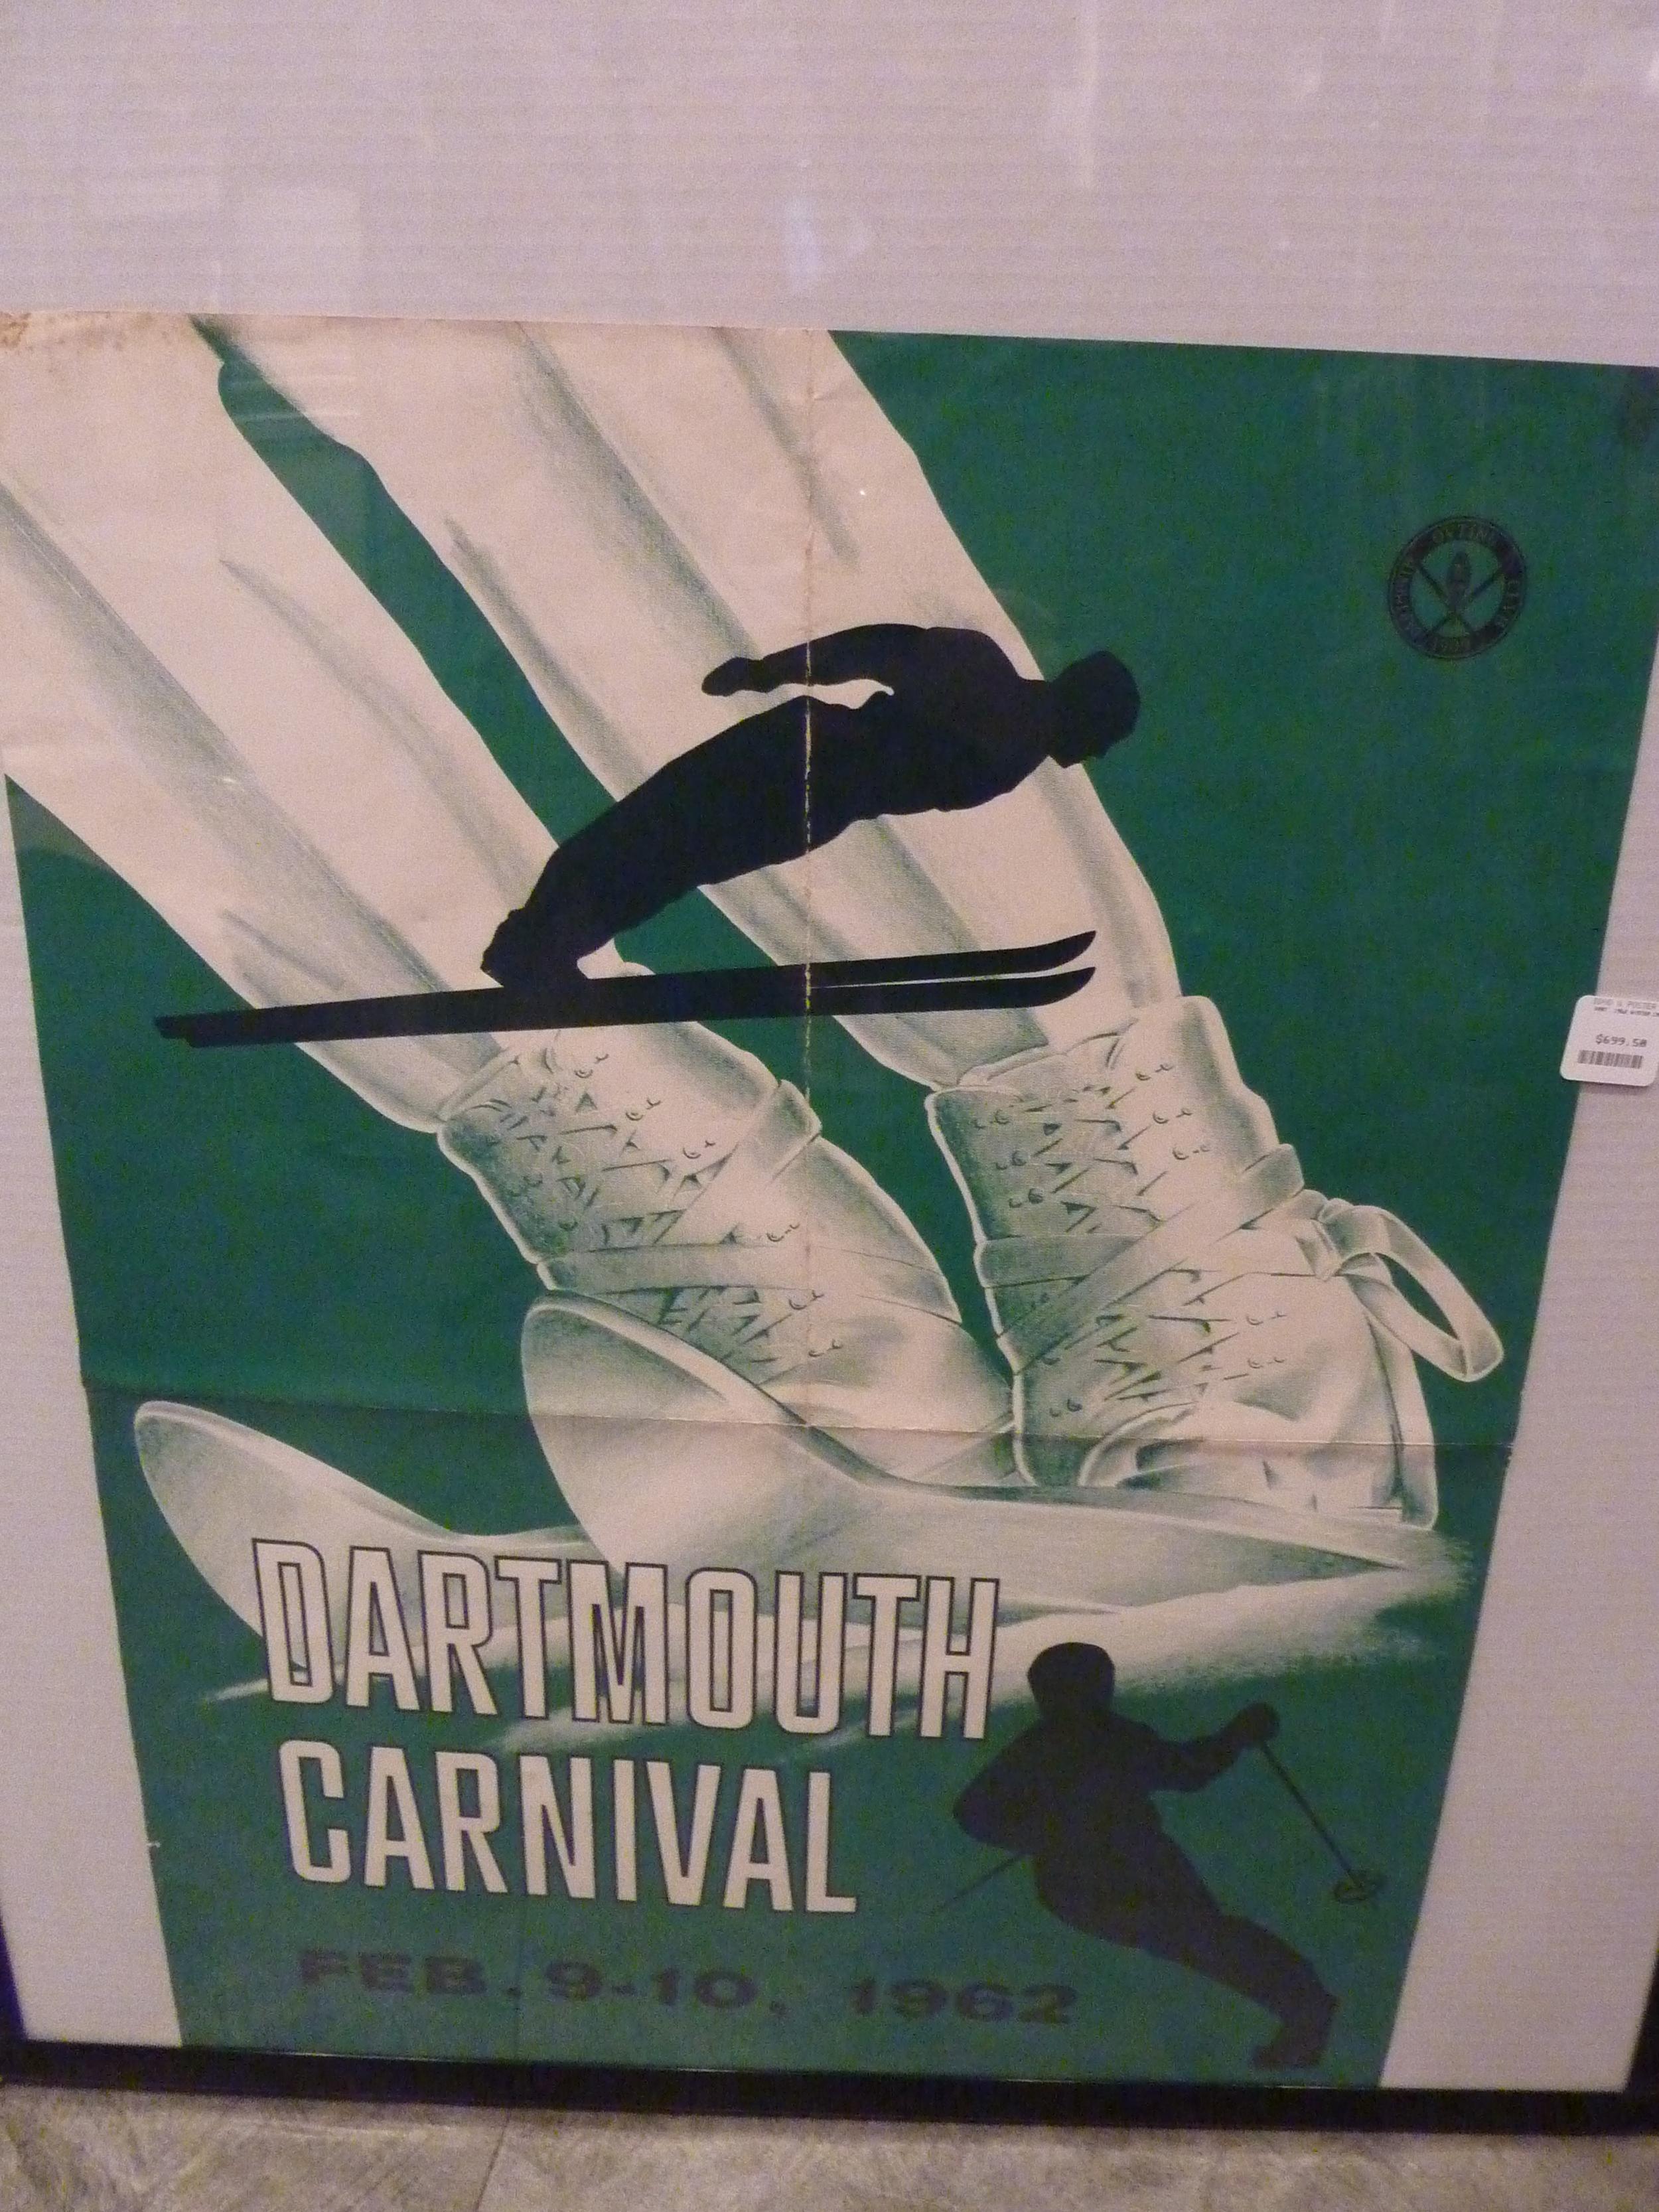 Dartmouth Winter Carnival 1962 (green)